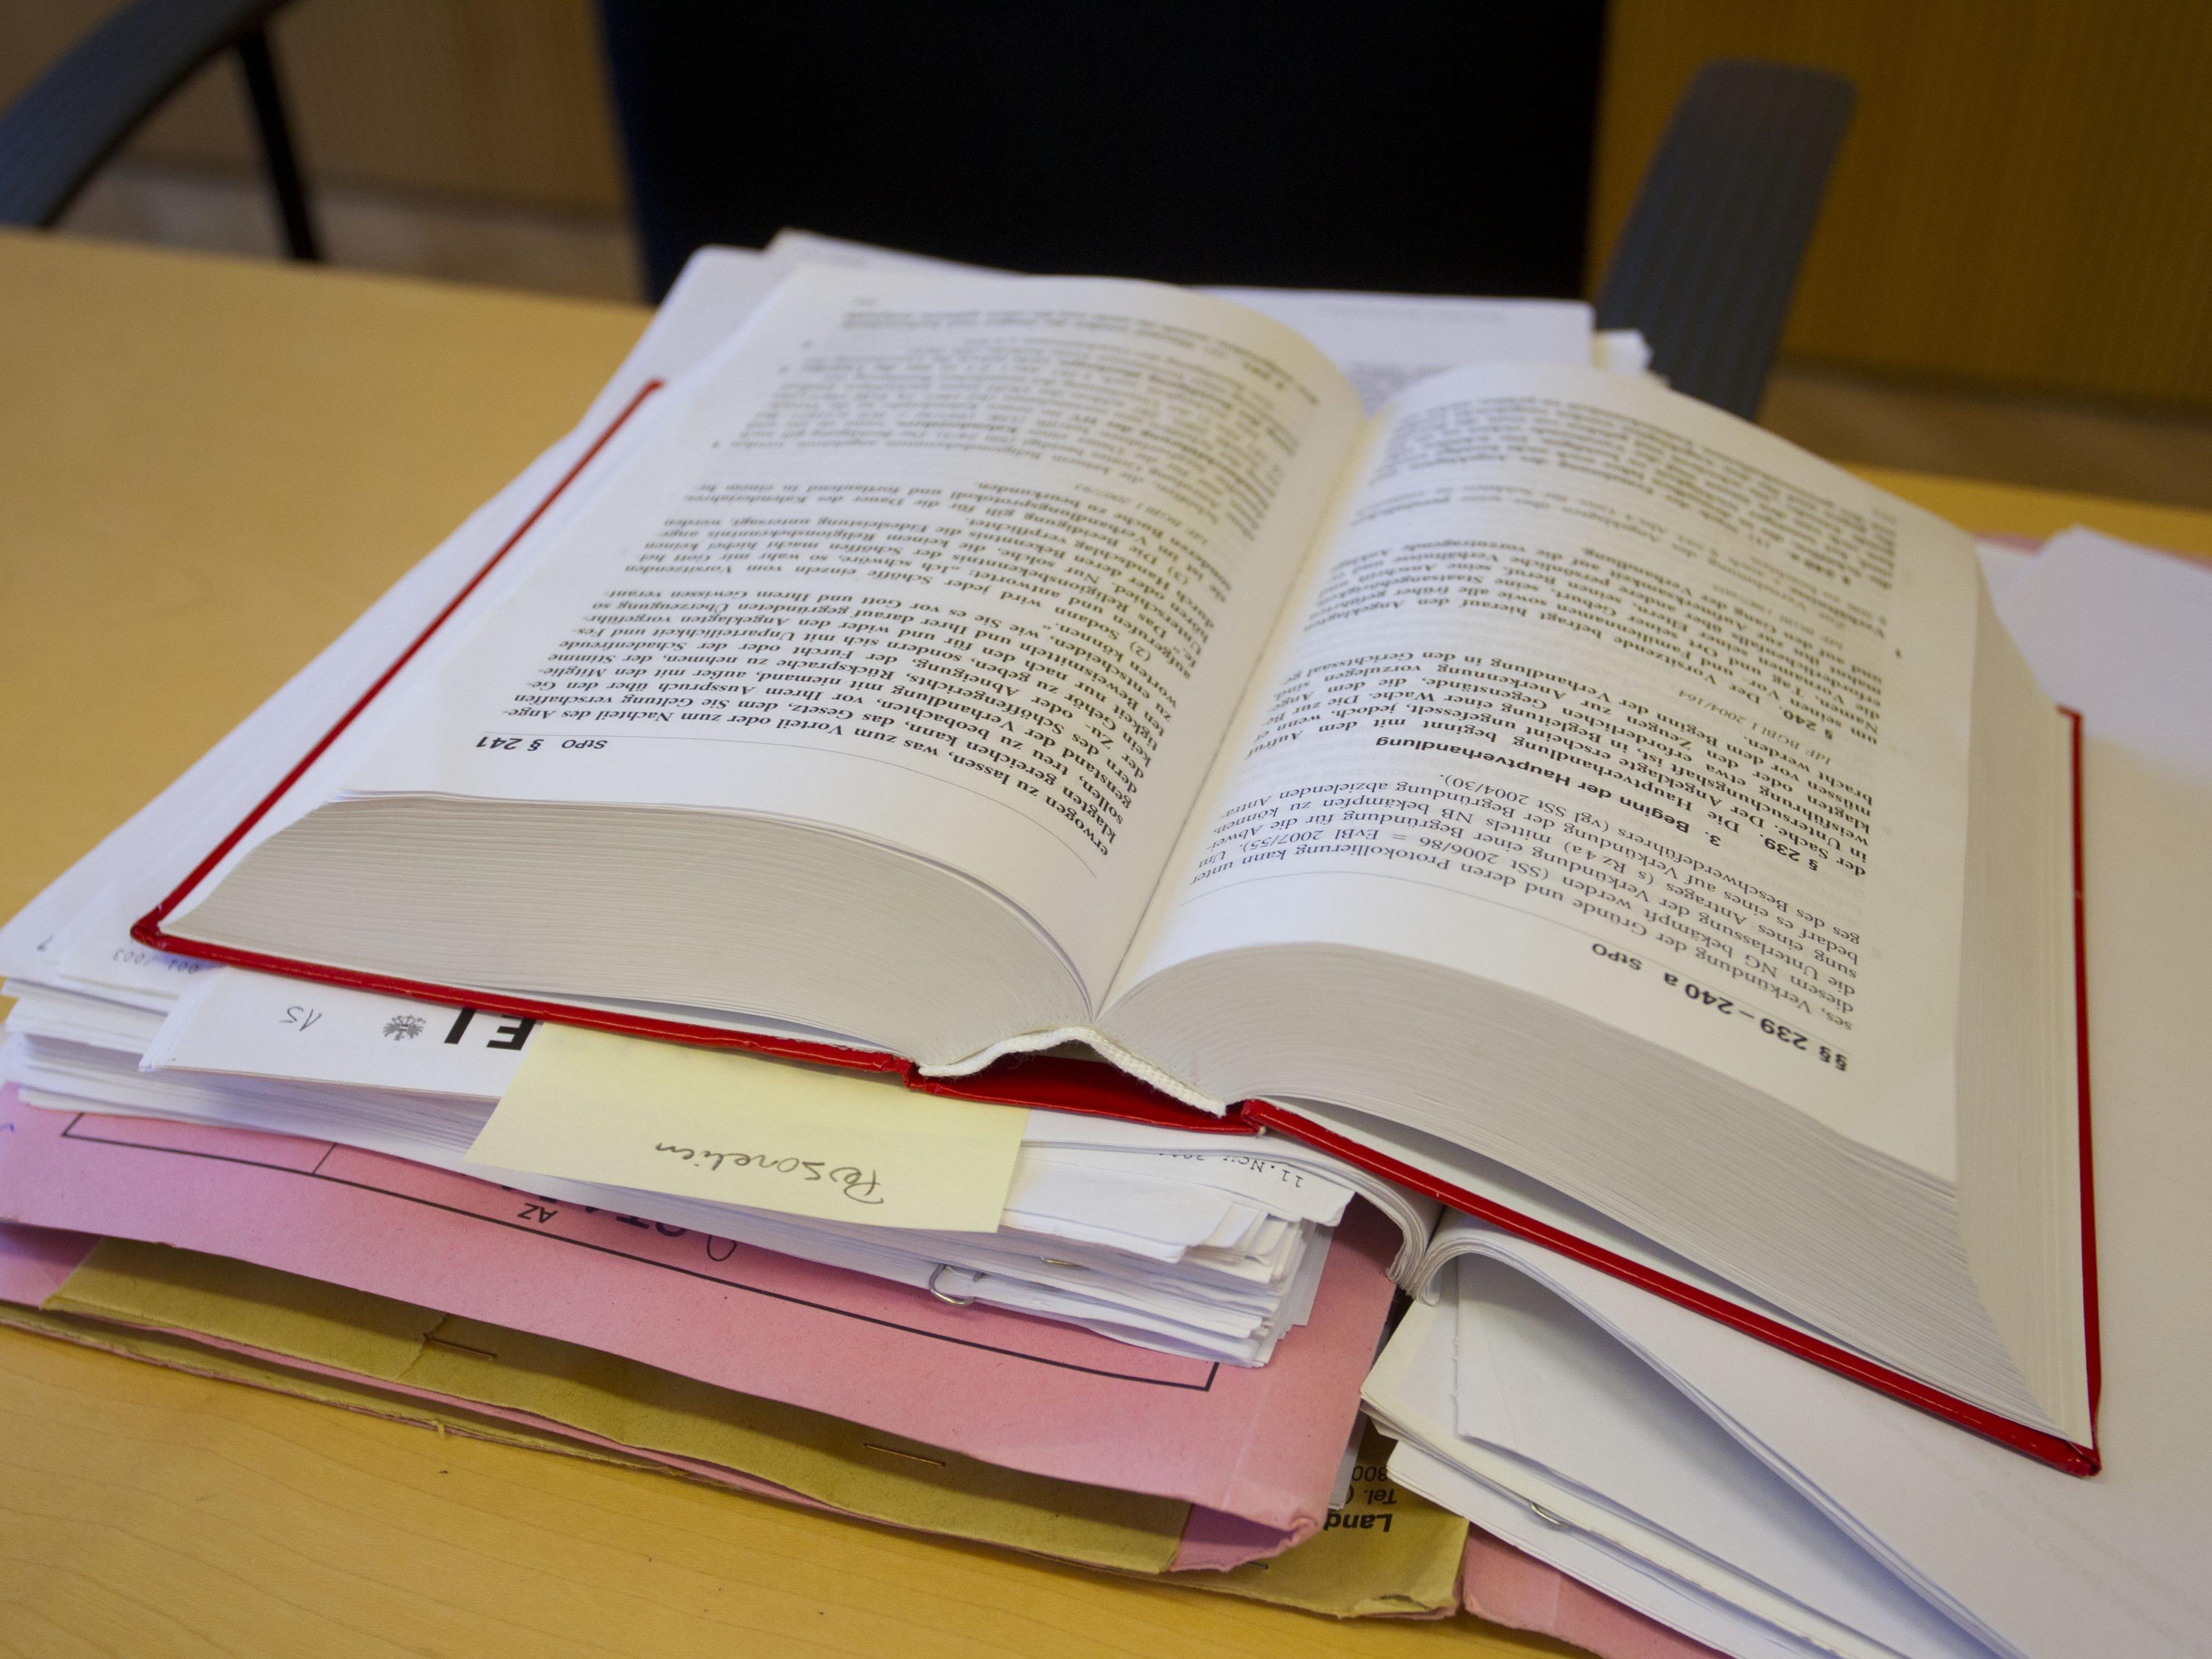 Novelle zum Strafgesetzbuch trat mit Jänner 2016 in Kraft.